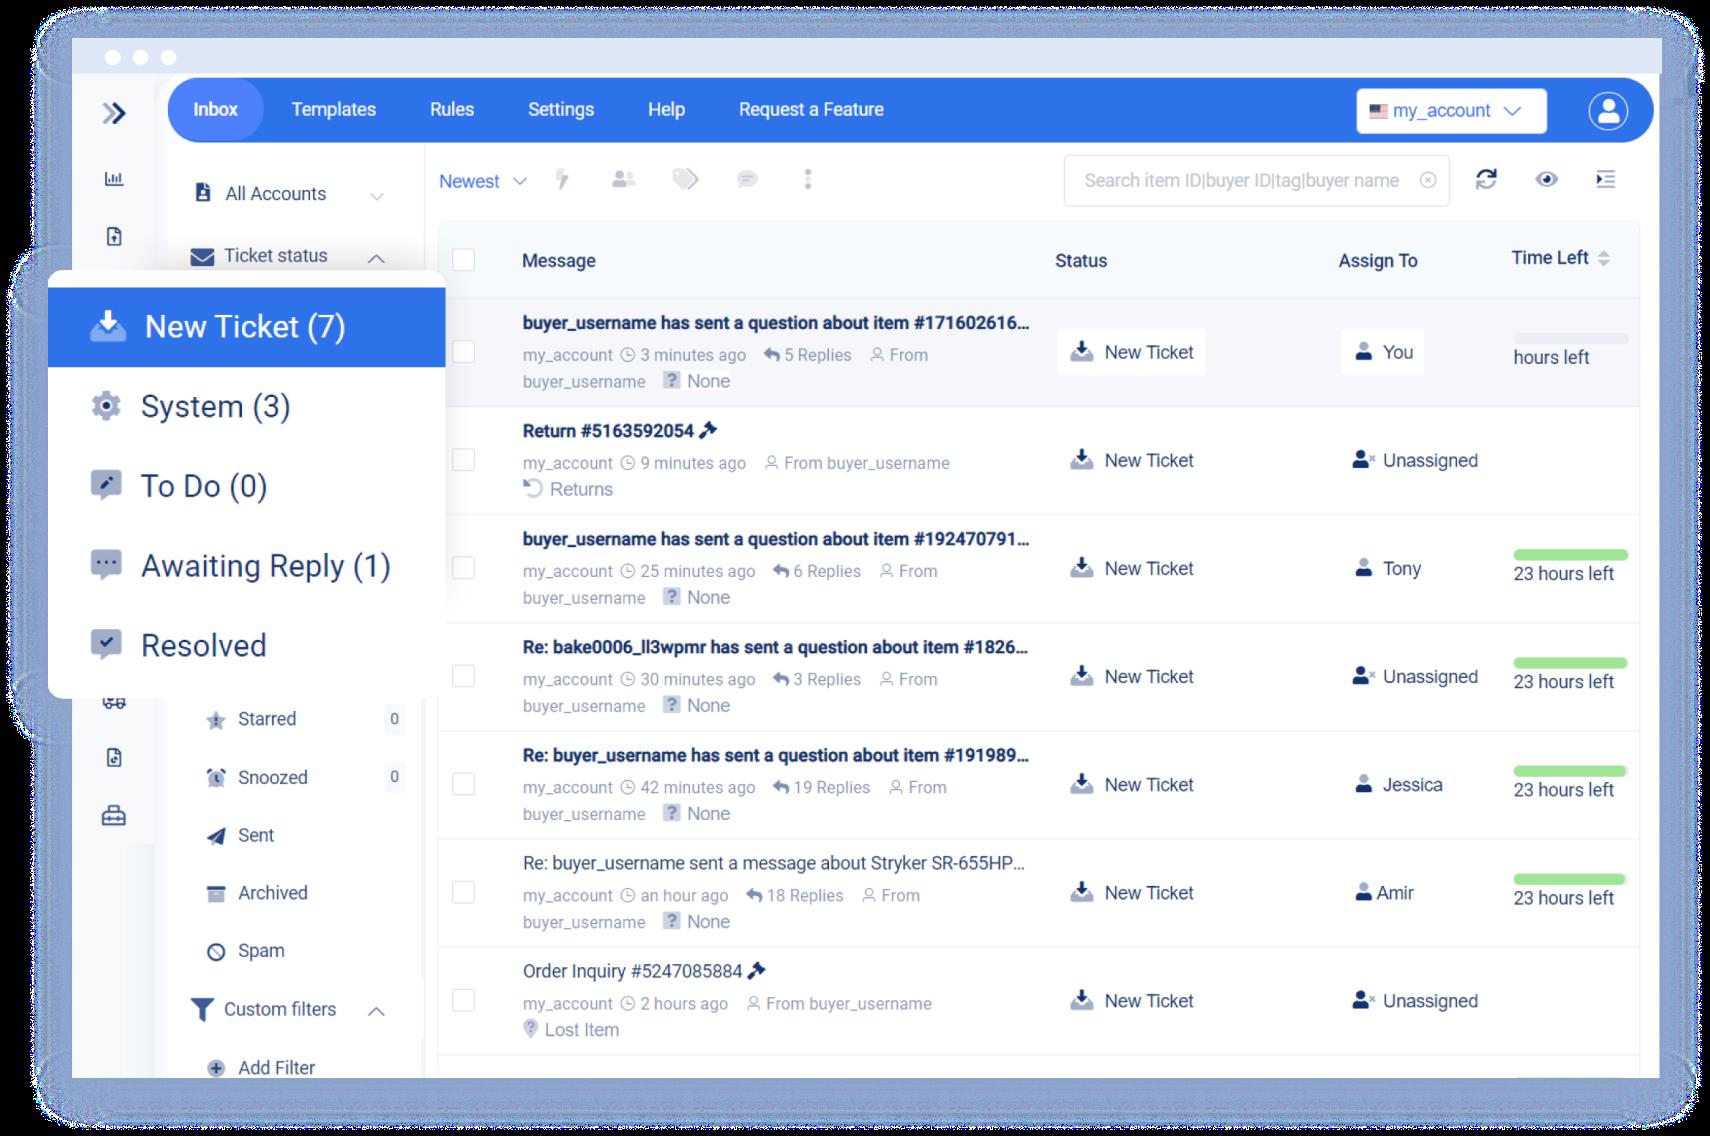 Screenshot 3Dsellers' Multichannel helpdesk eBay CRM inbox.